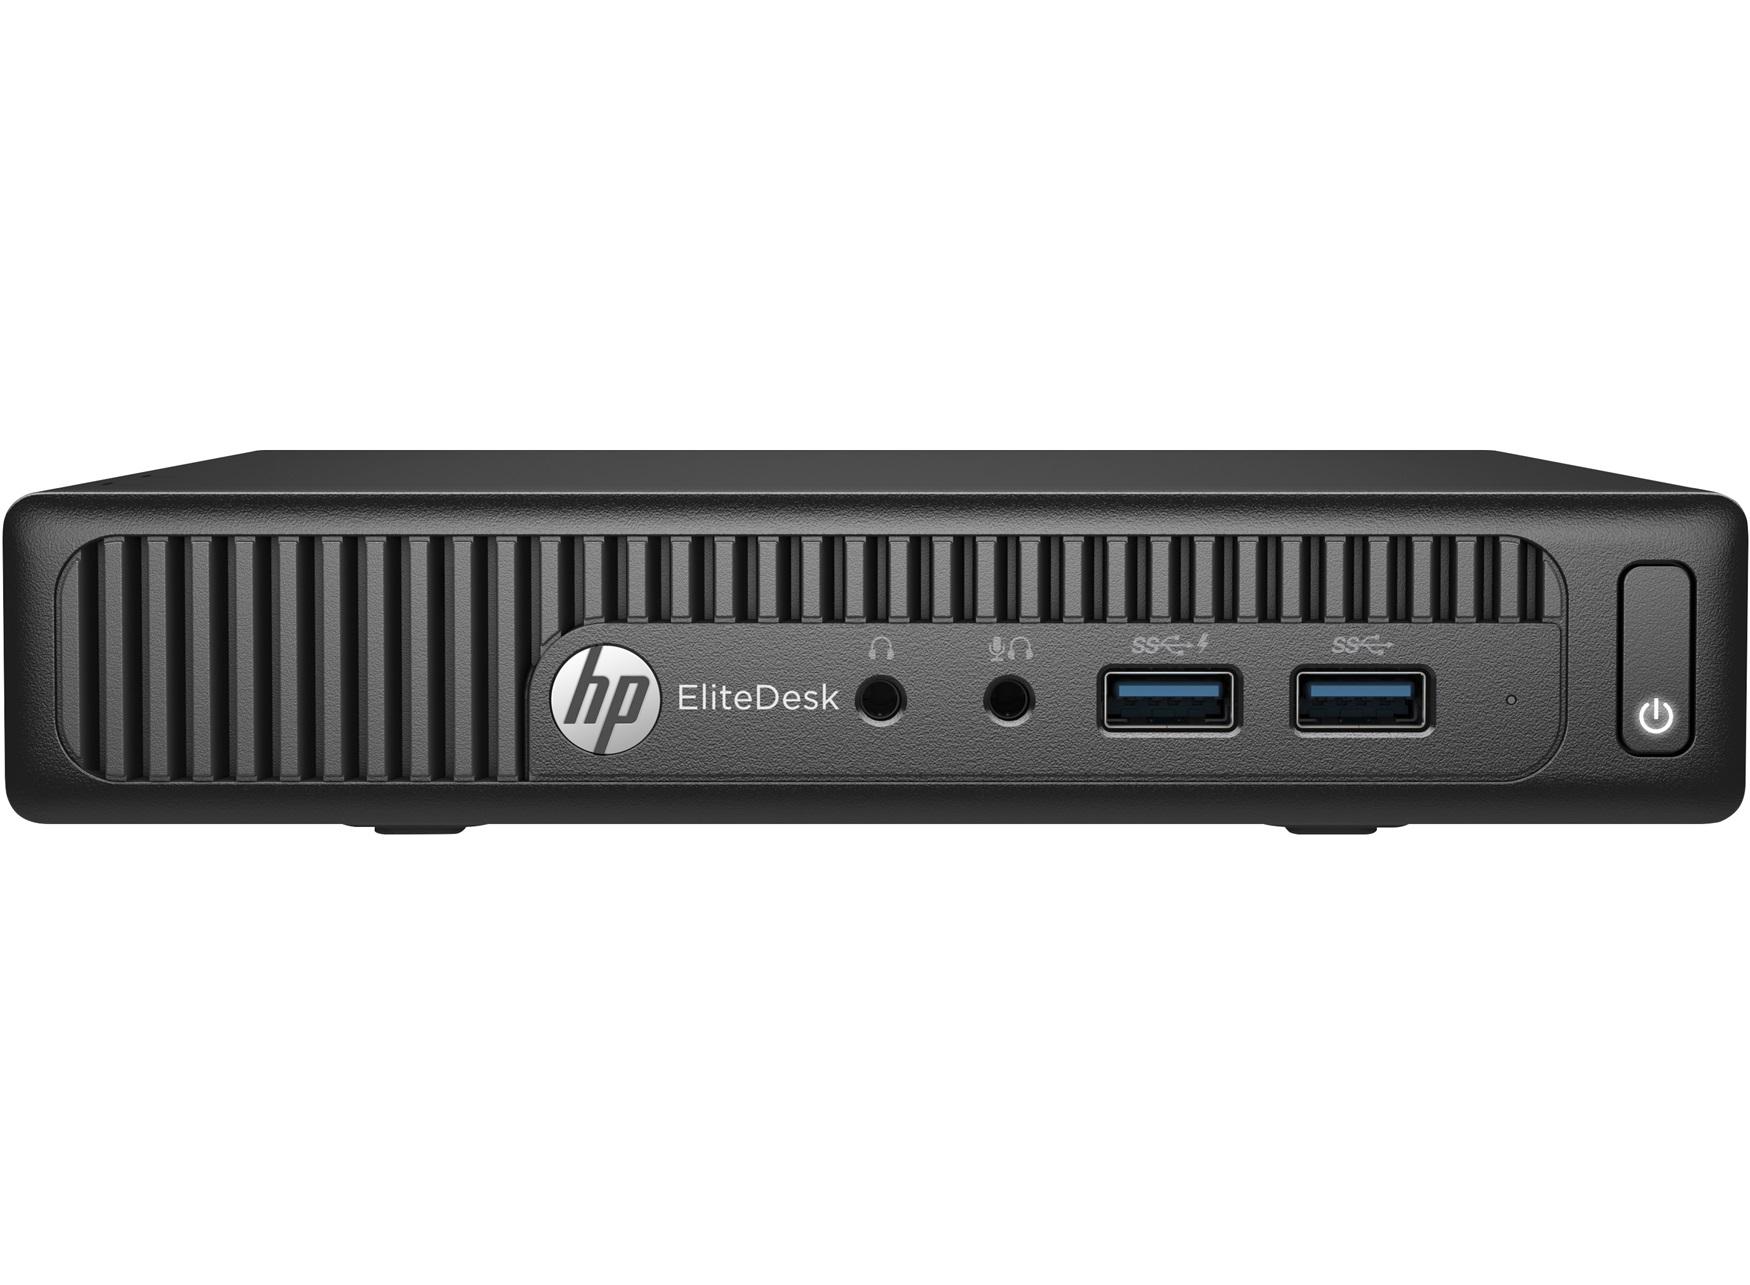 hp 800 g1 mini desktop